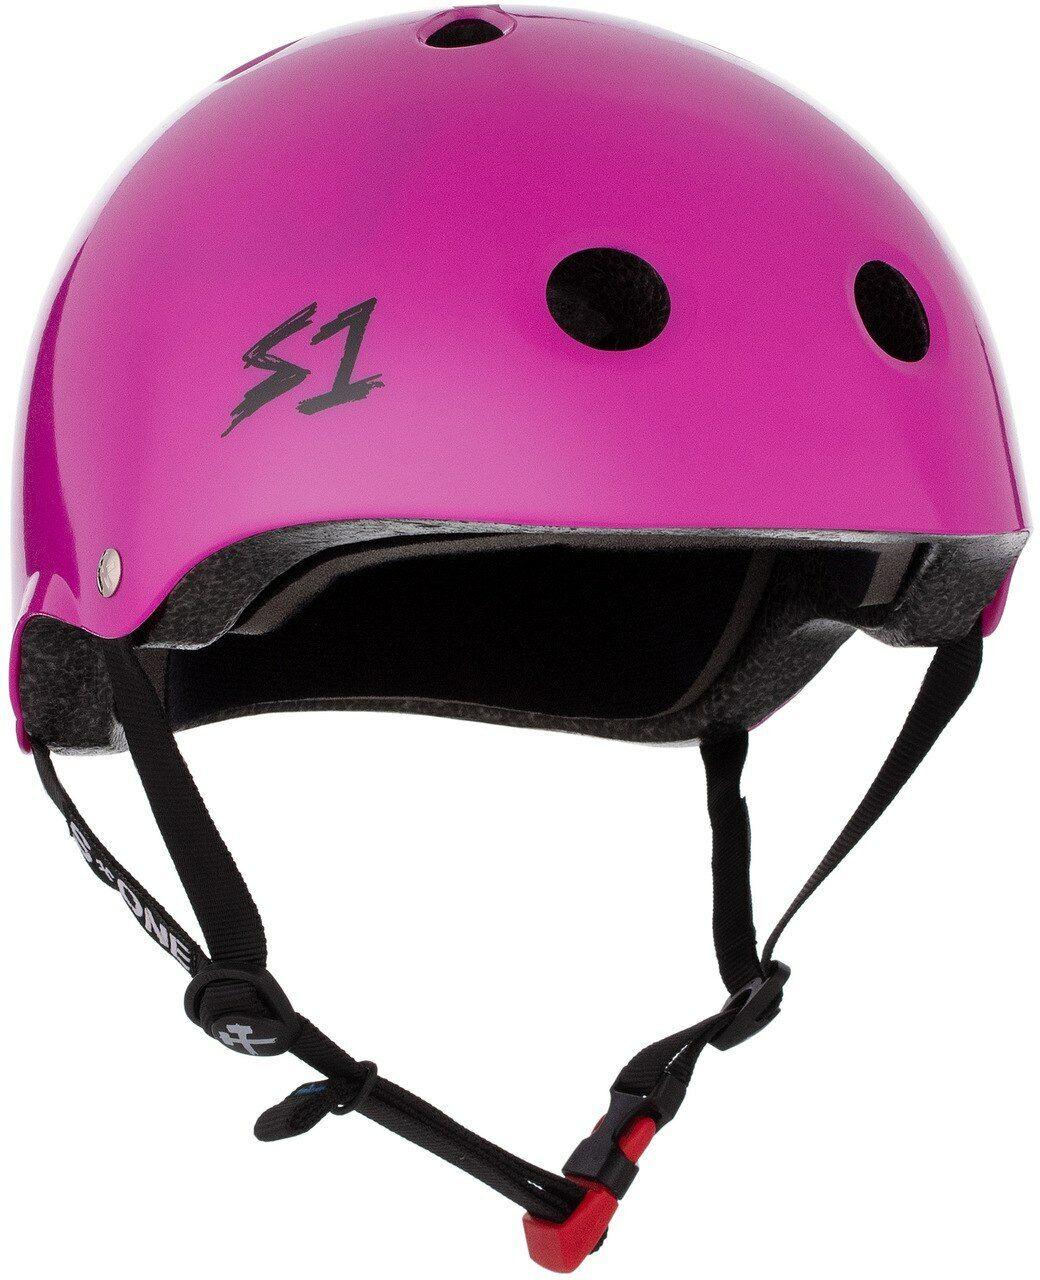 S1 Mini Lifer  Helmet - Bright Purple Gloss  high quaity